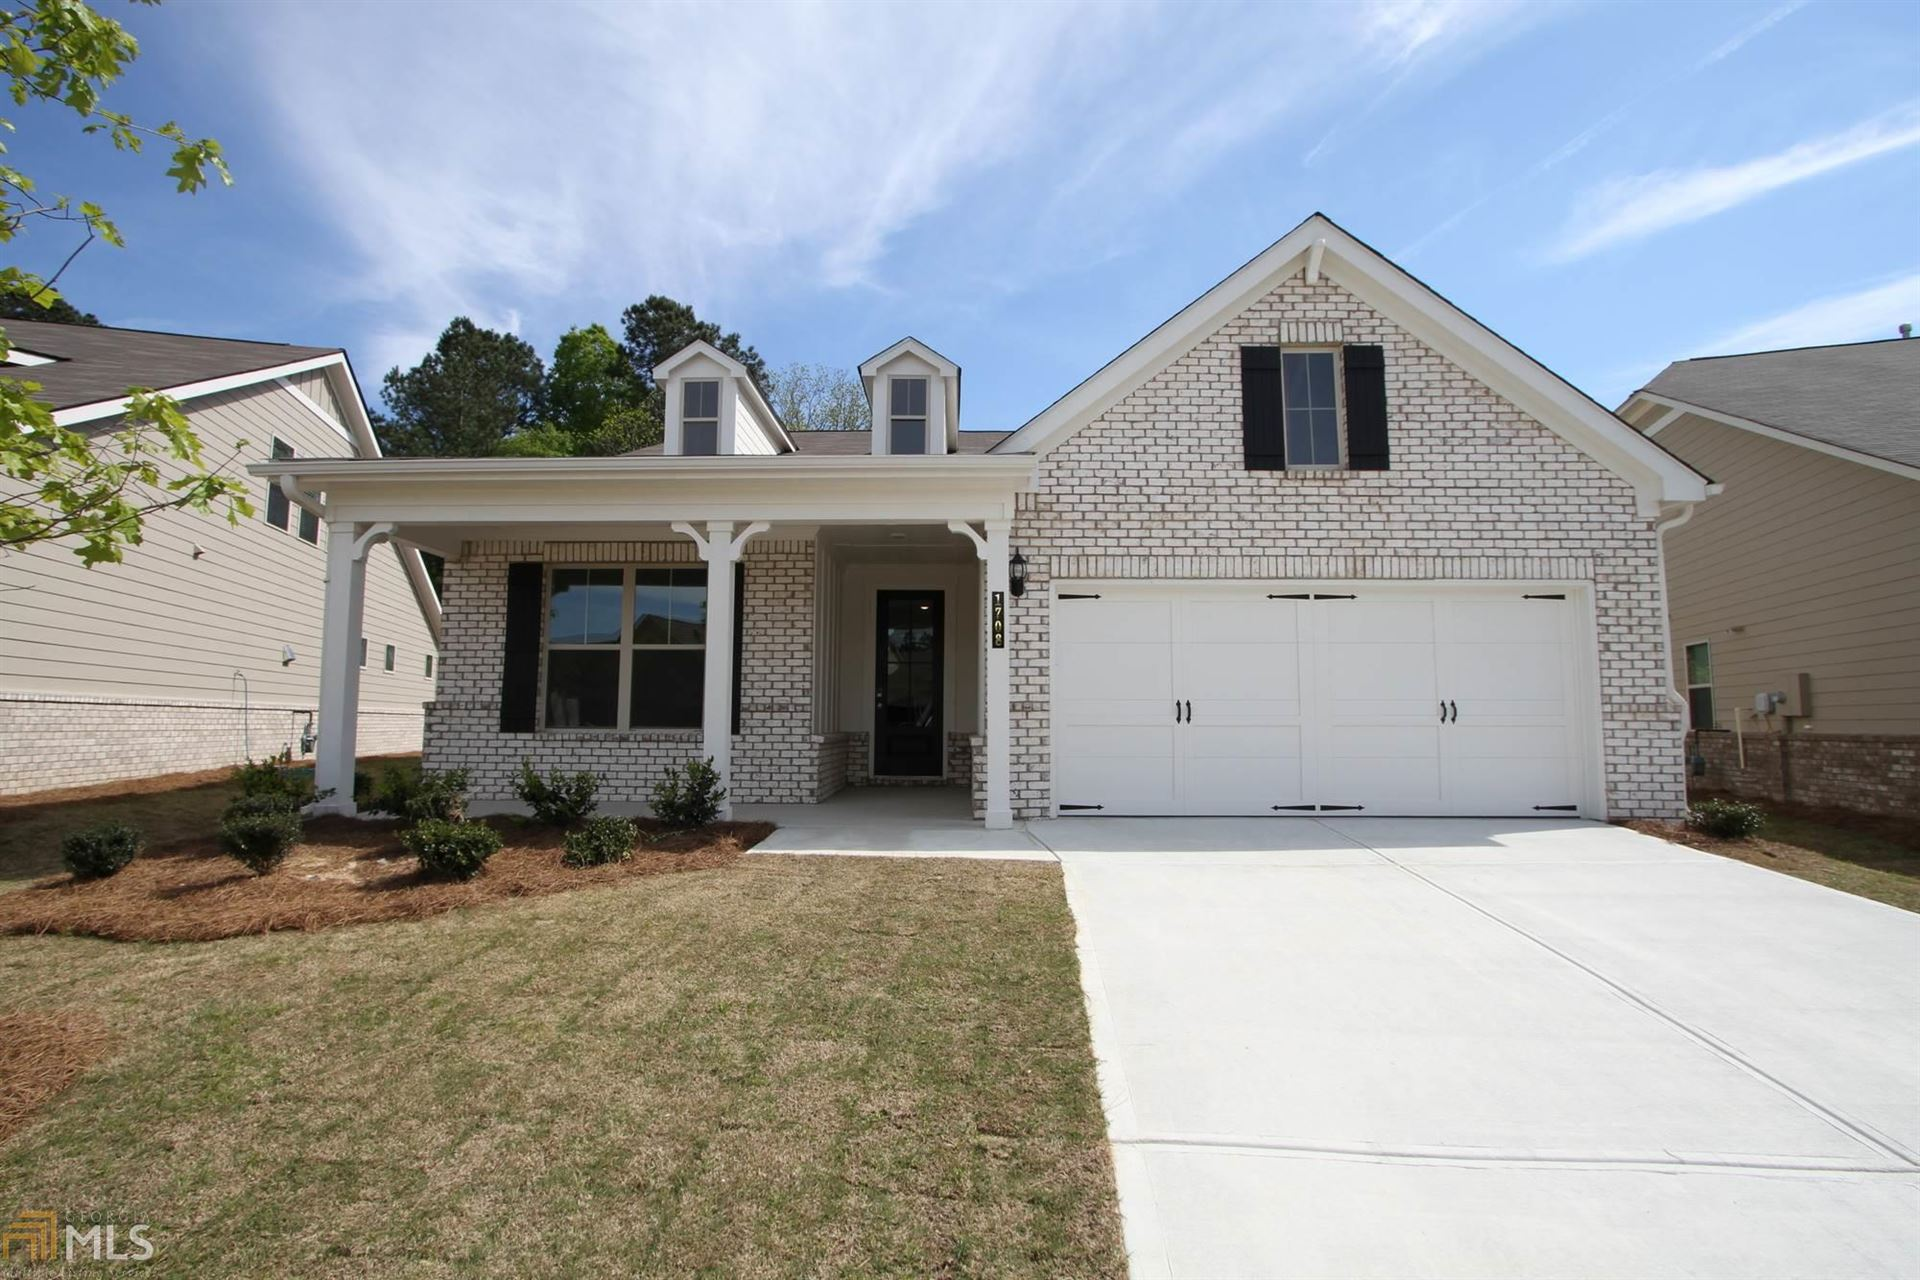 147 Rolling Hills Pl, Canton, GA 30114 - MLS#: 8884111